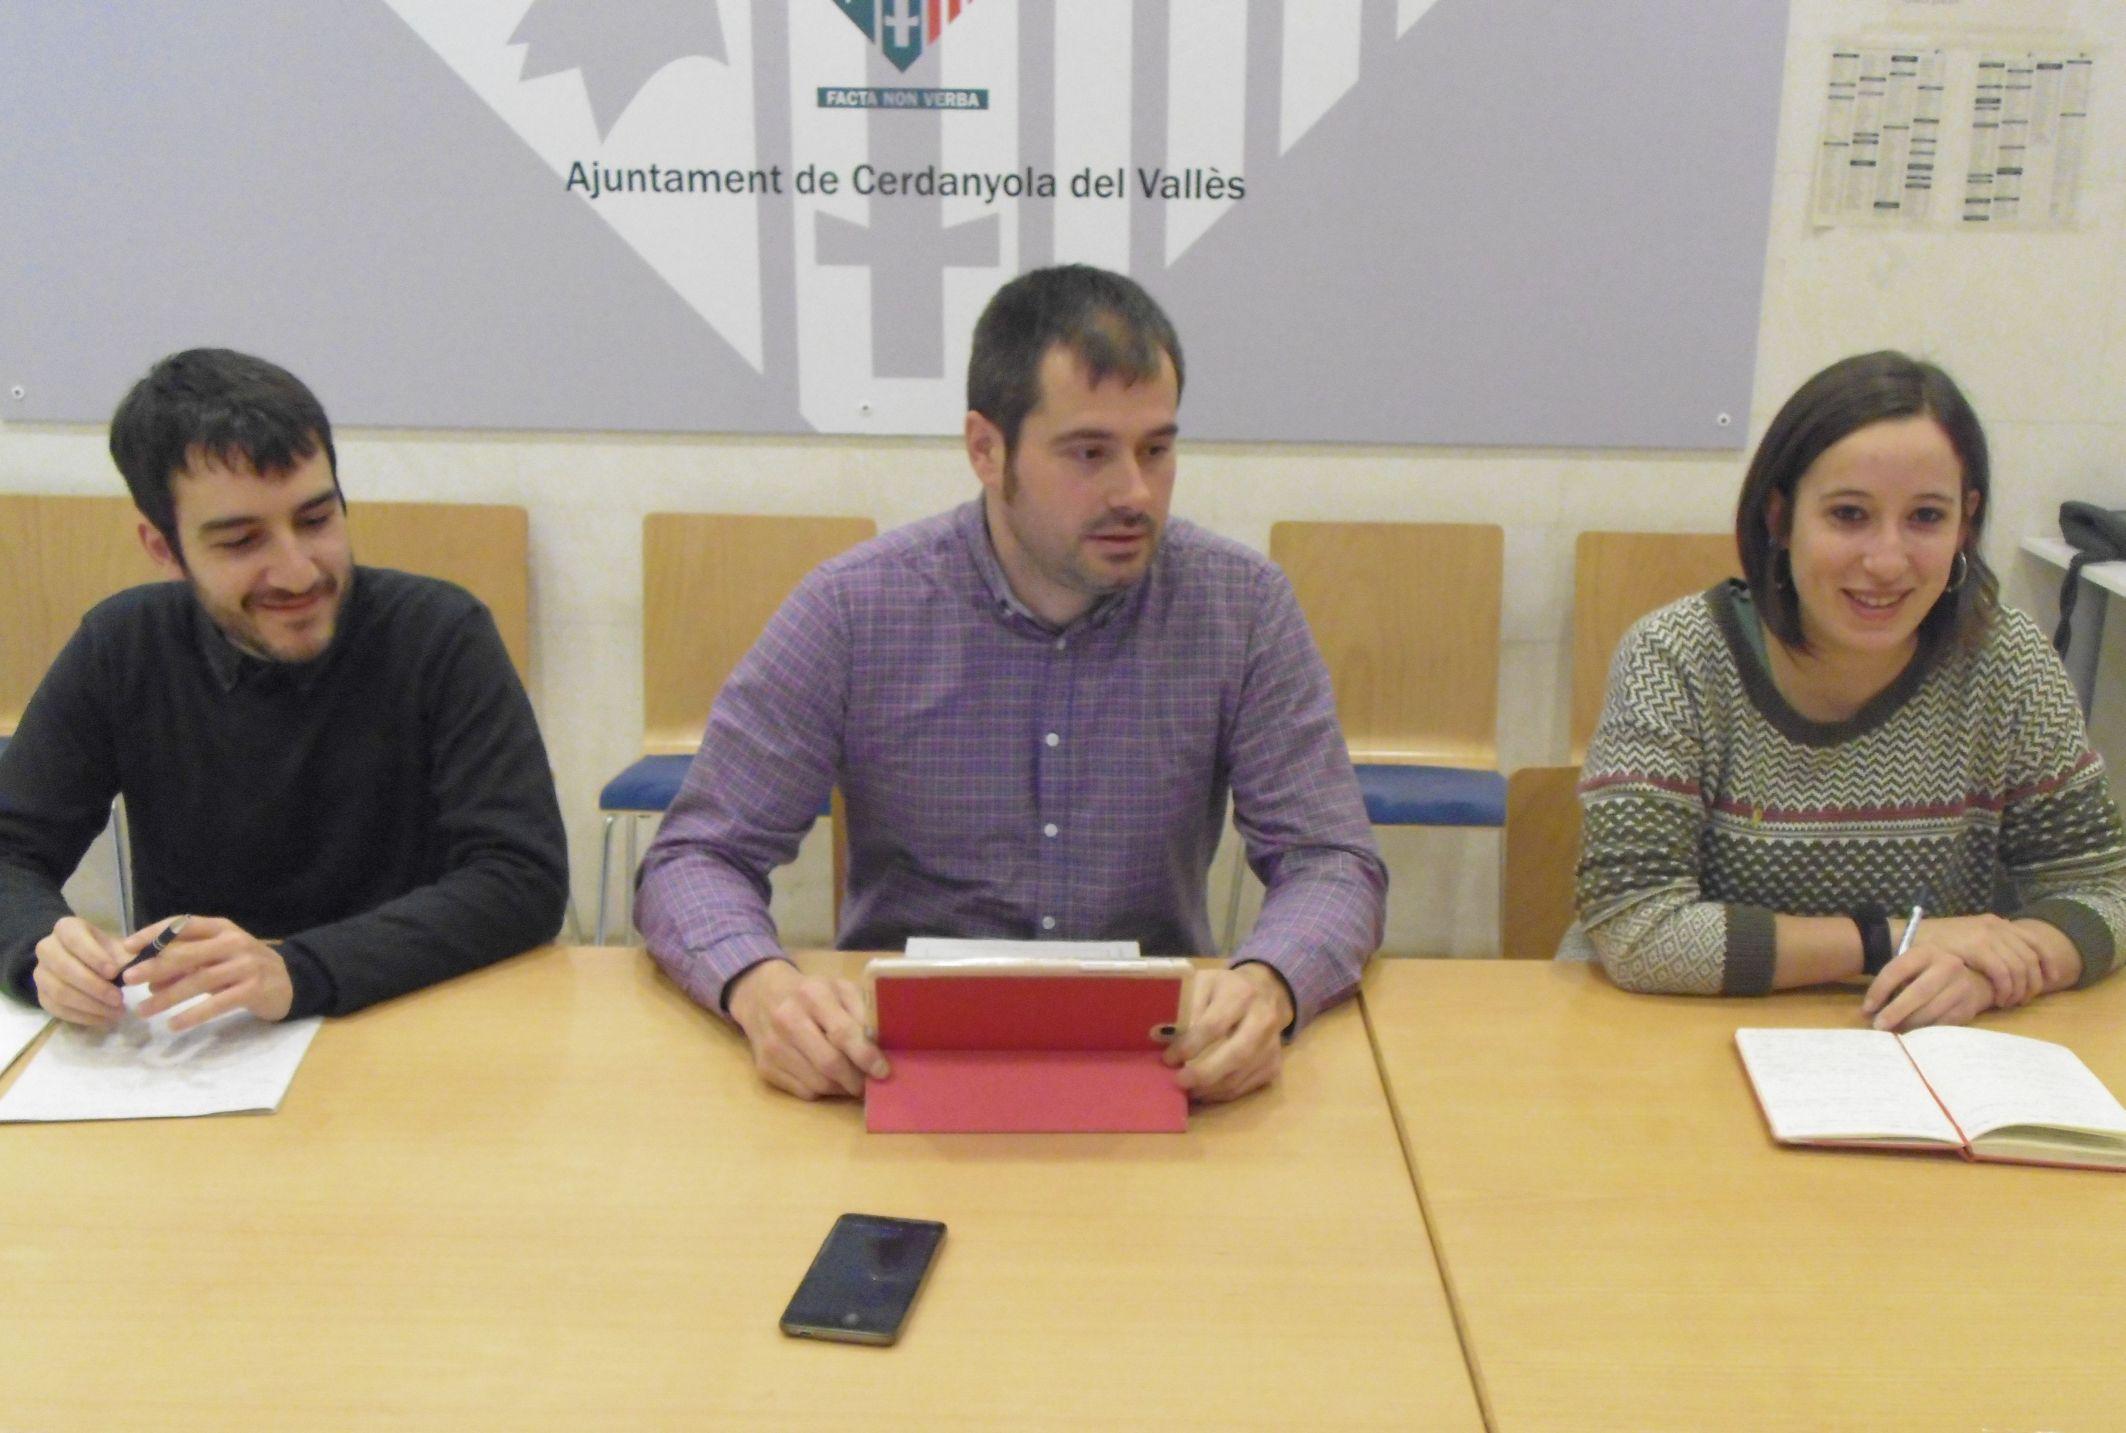 Ivan González, Carles Escolà i Laura Benseny